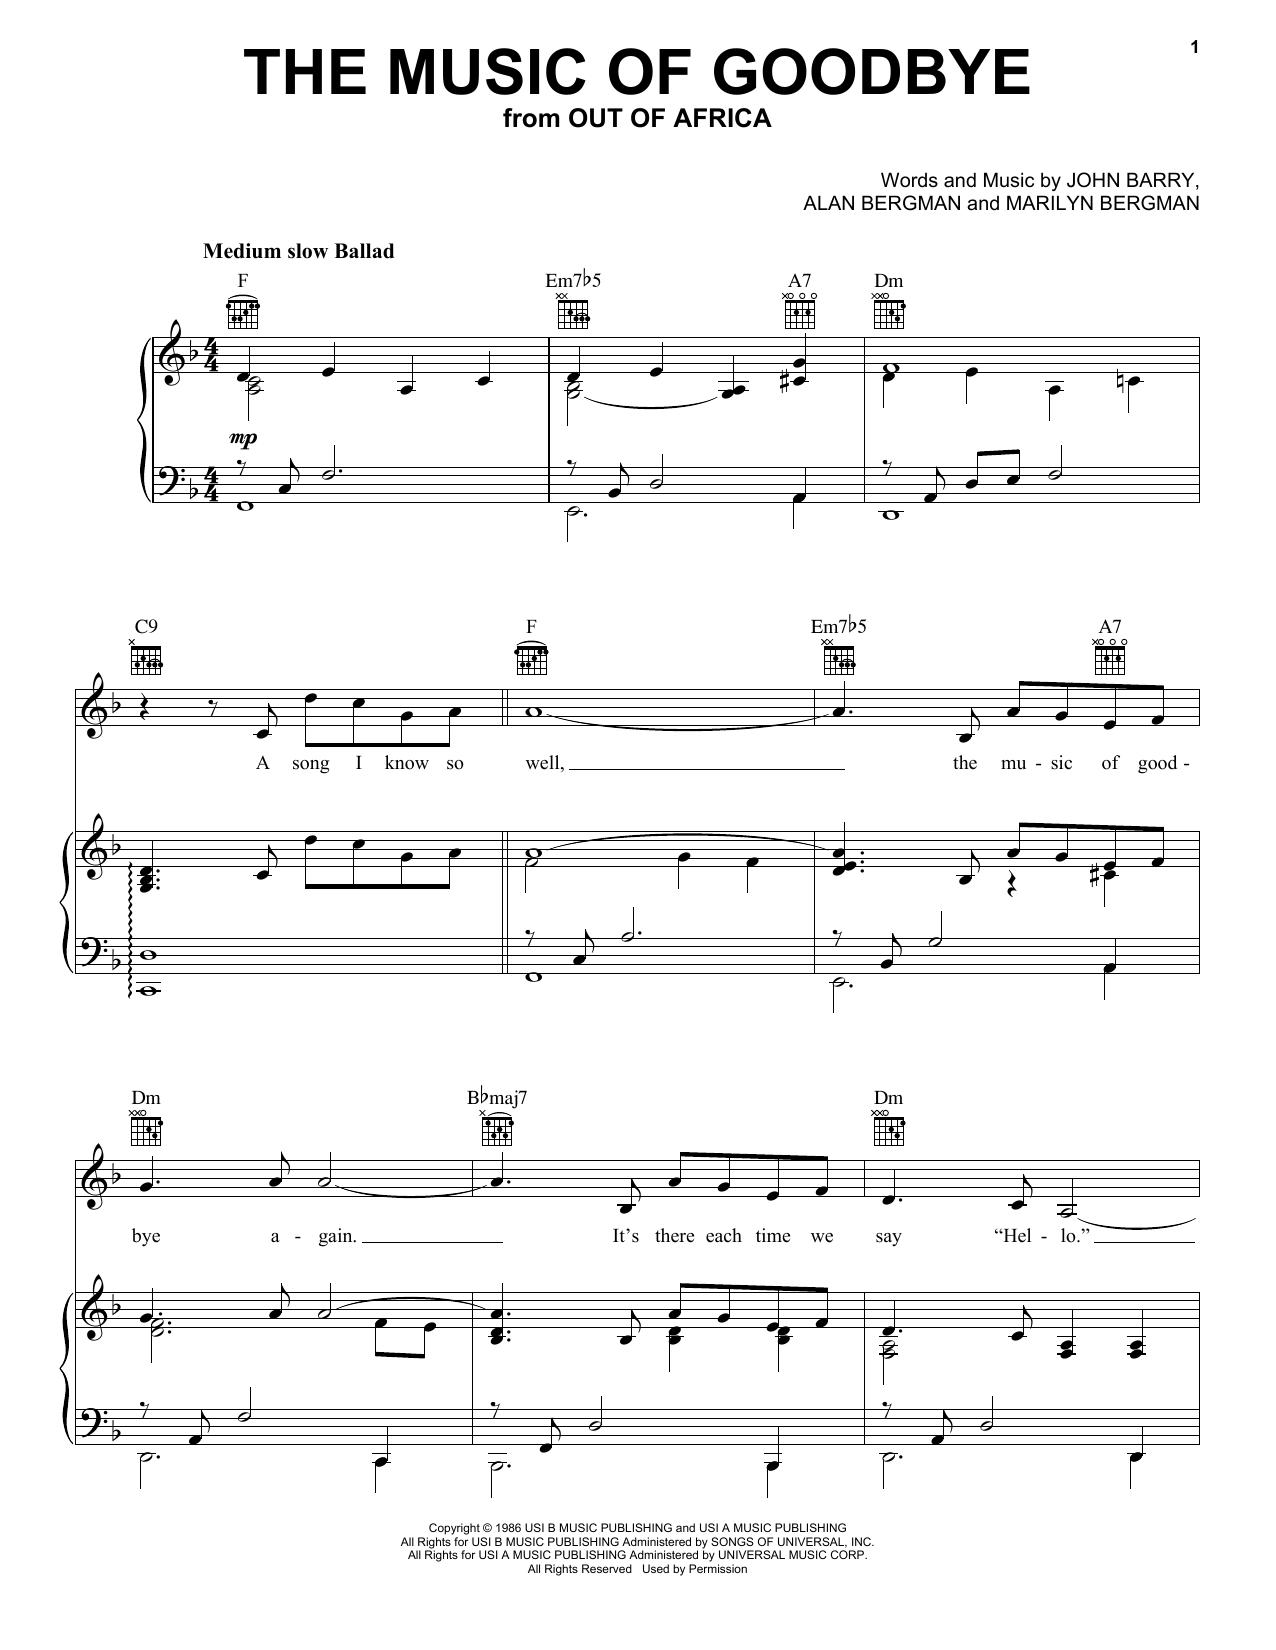 Alan Bergman The Music Of Goodbye sheet music notes and chords. Download Printable PDF.